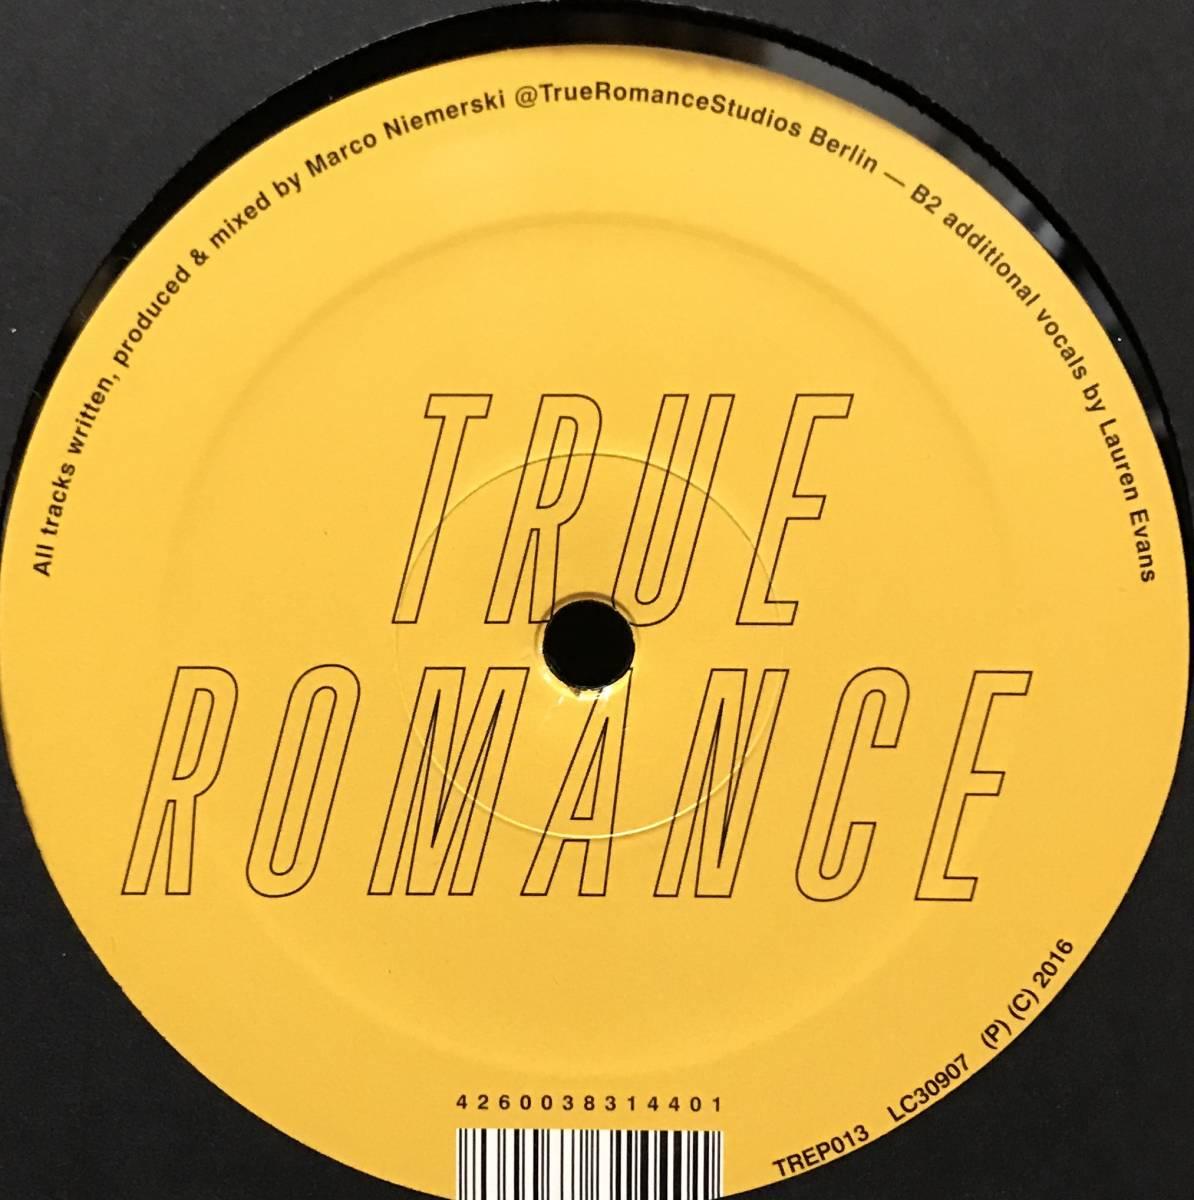 [12] Tensnake - Freundchen (Tech House) ☆True Romance キラー! スペーストリップ! ディスコハウス! レコード Vinyl_画像3